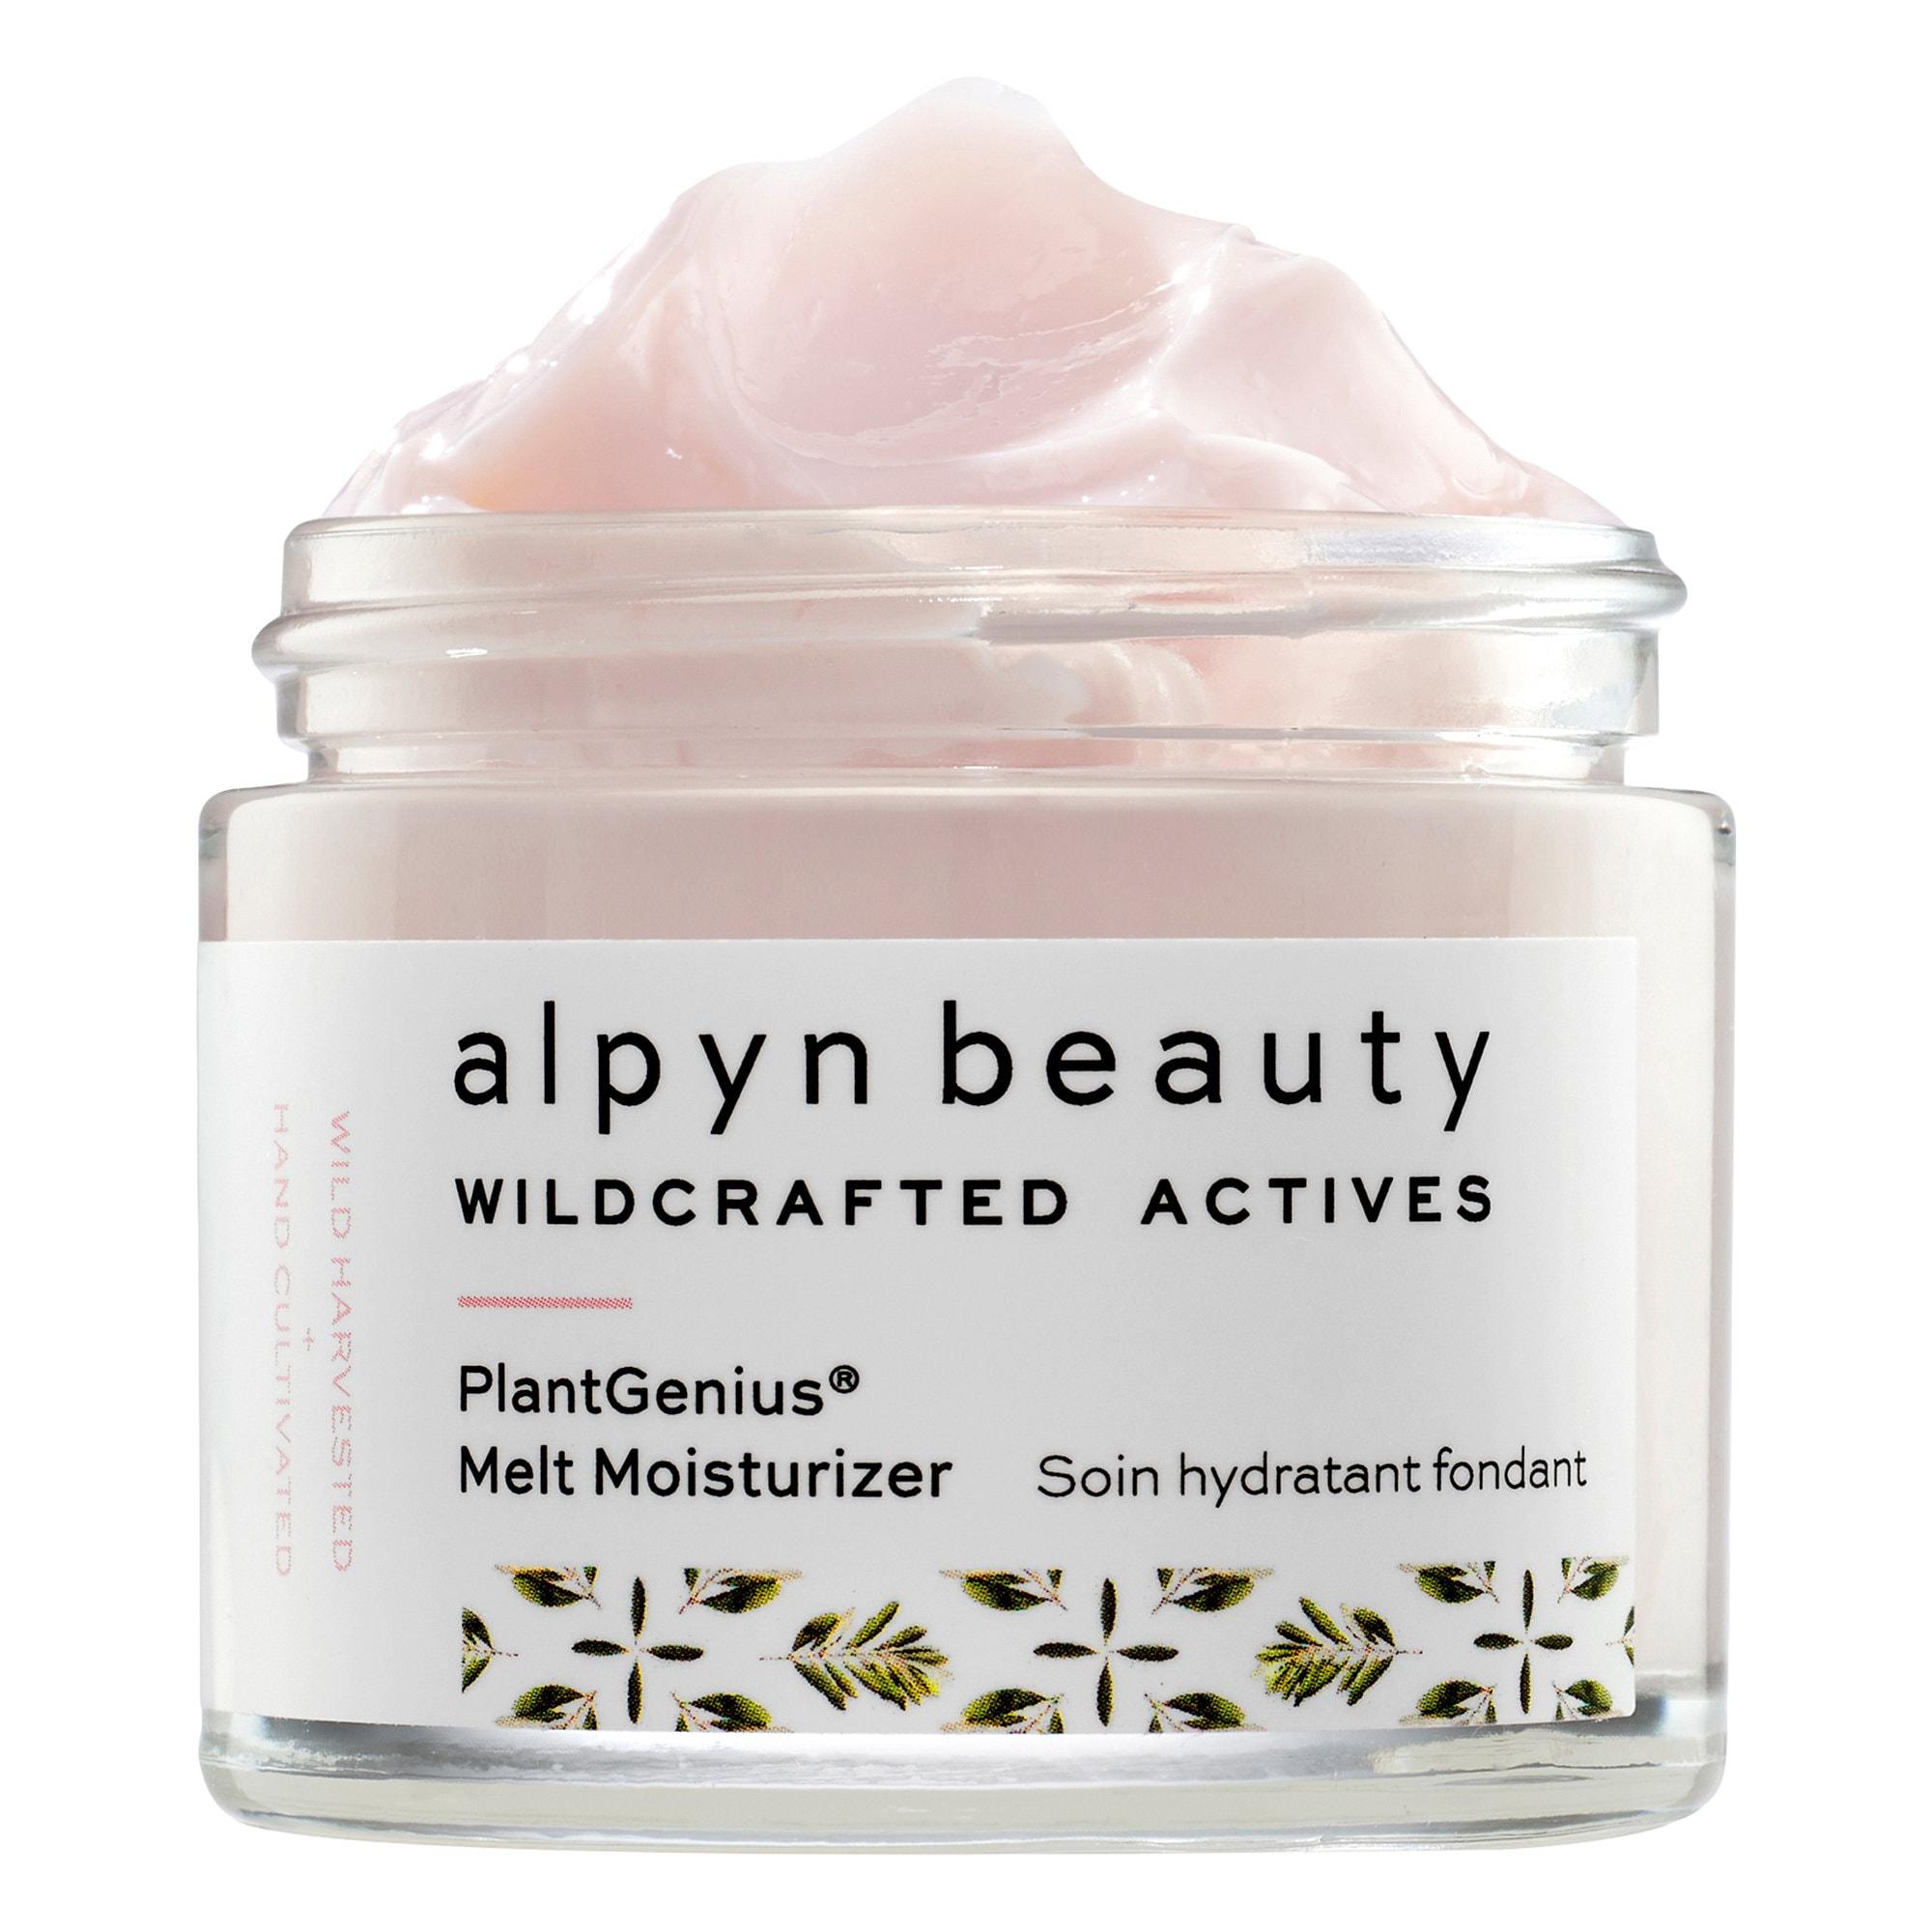 alpyn beauty - PlantGenius® Melt Moisturizer with Bakuchiol